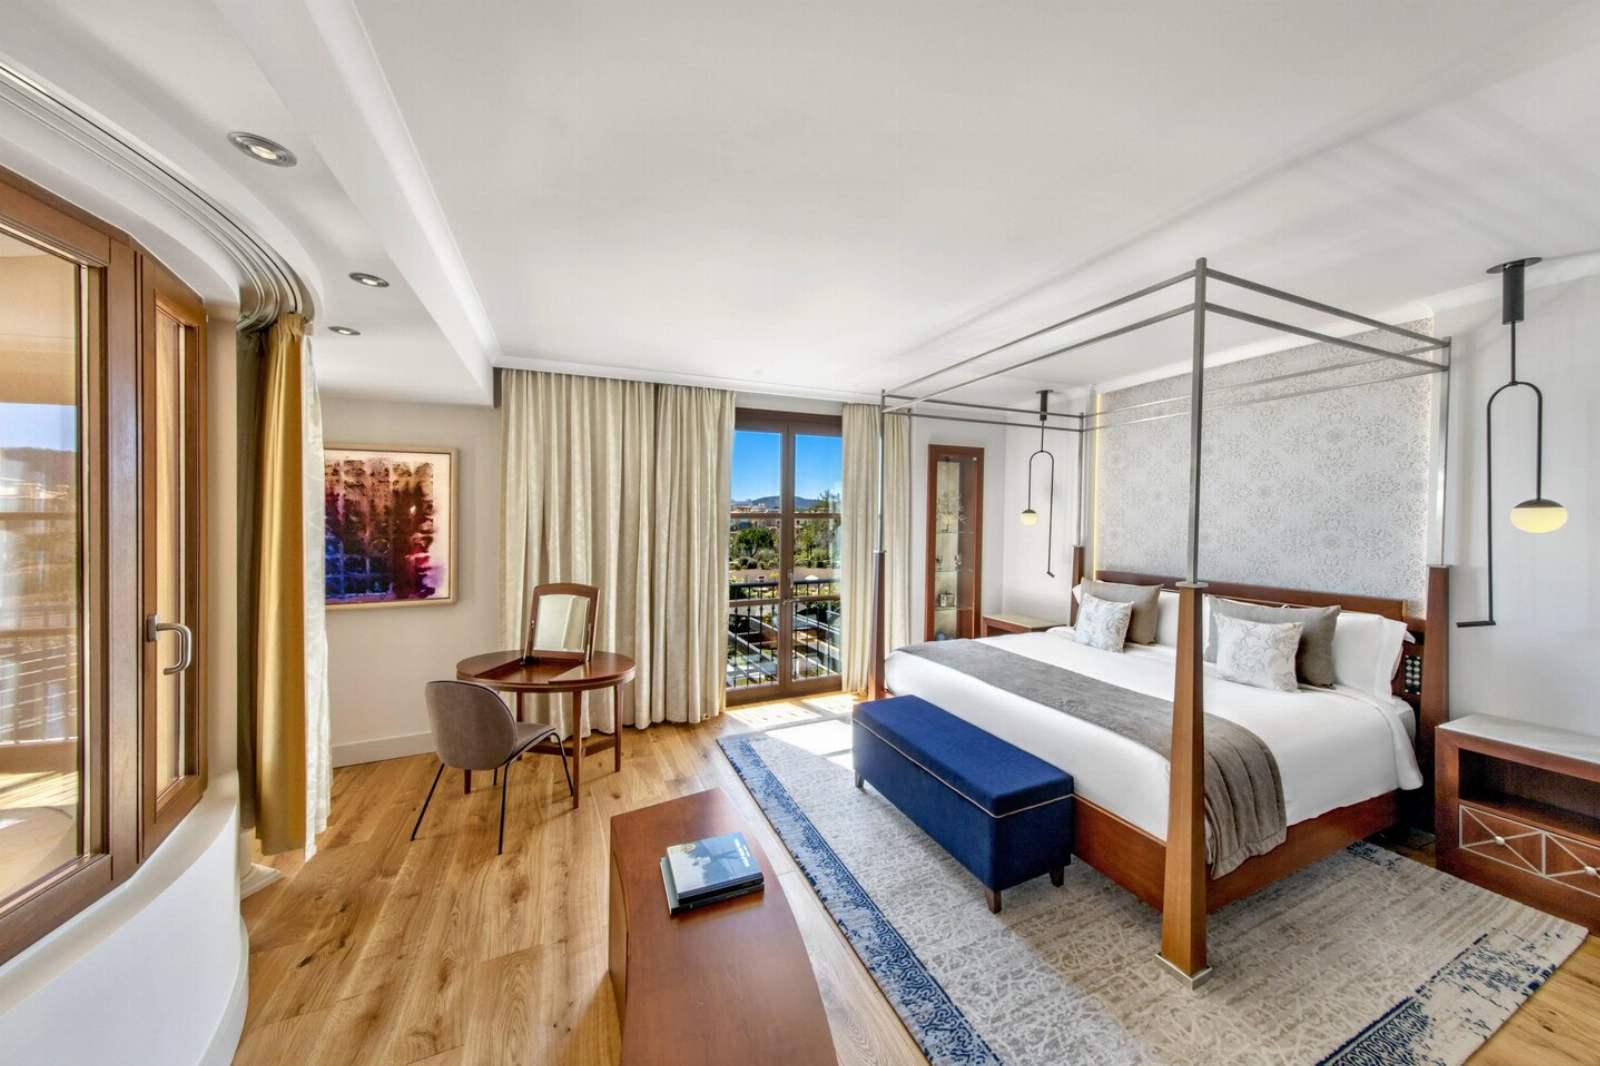 St. Regis Mardavall Resort - Mardavall Diamond Suite